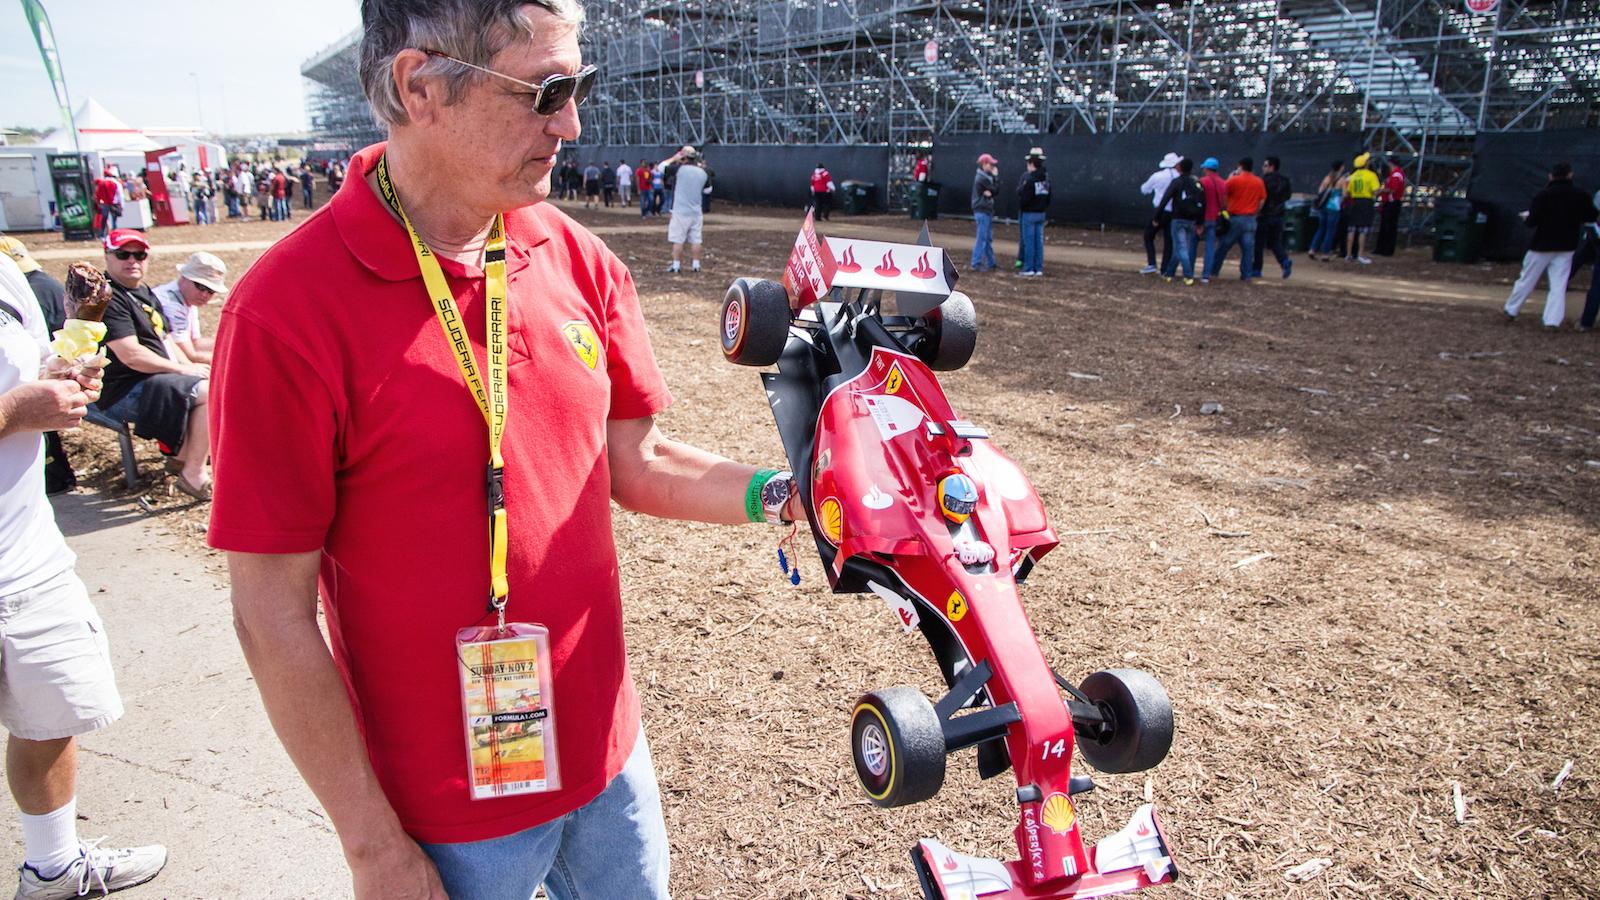 Kim Reimer with his intricate self-built Ferrari F1 hat, 2014 F1 United States Grand Prix